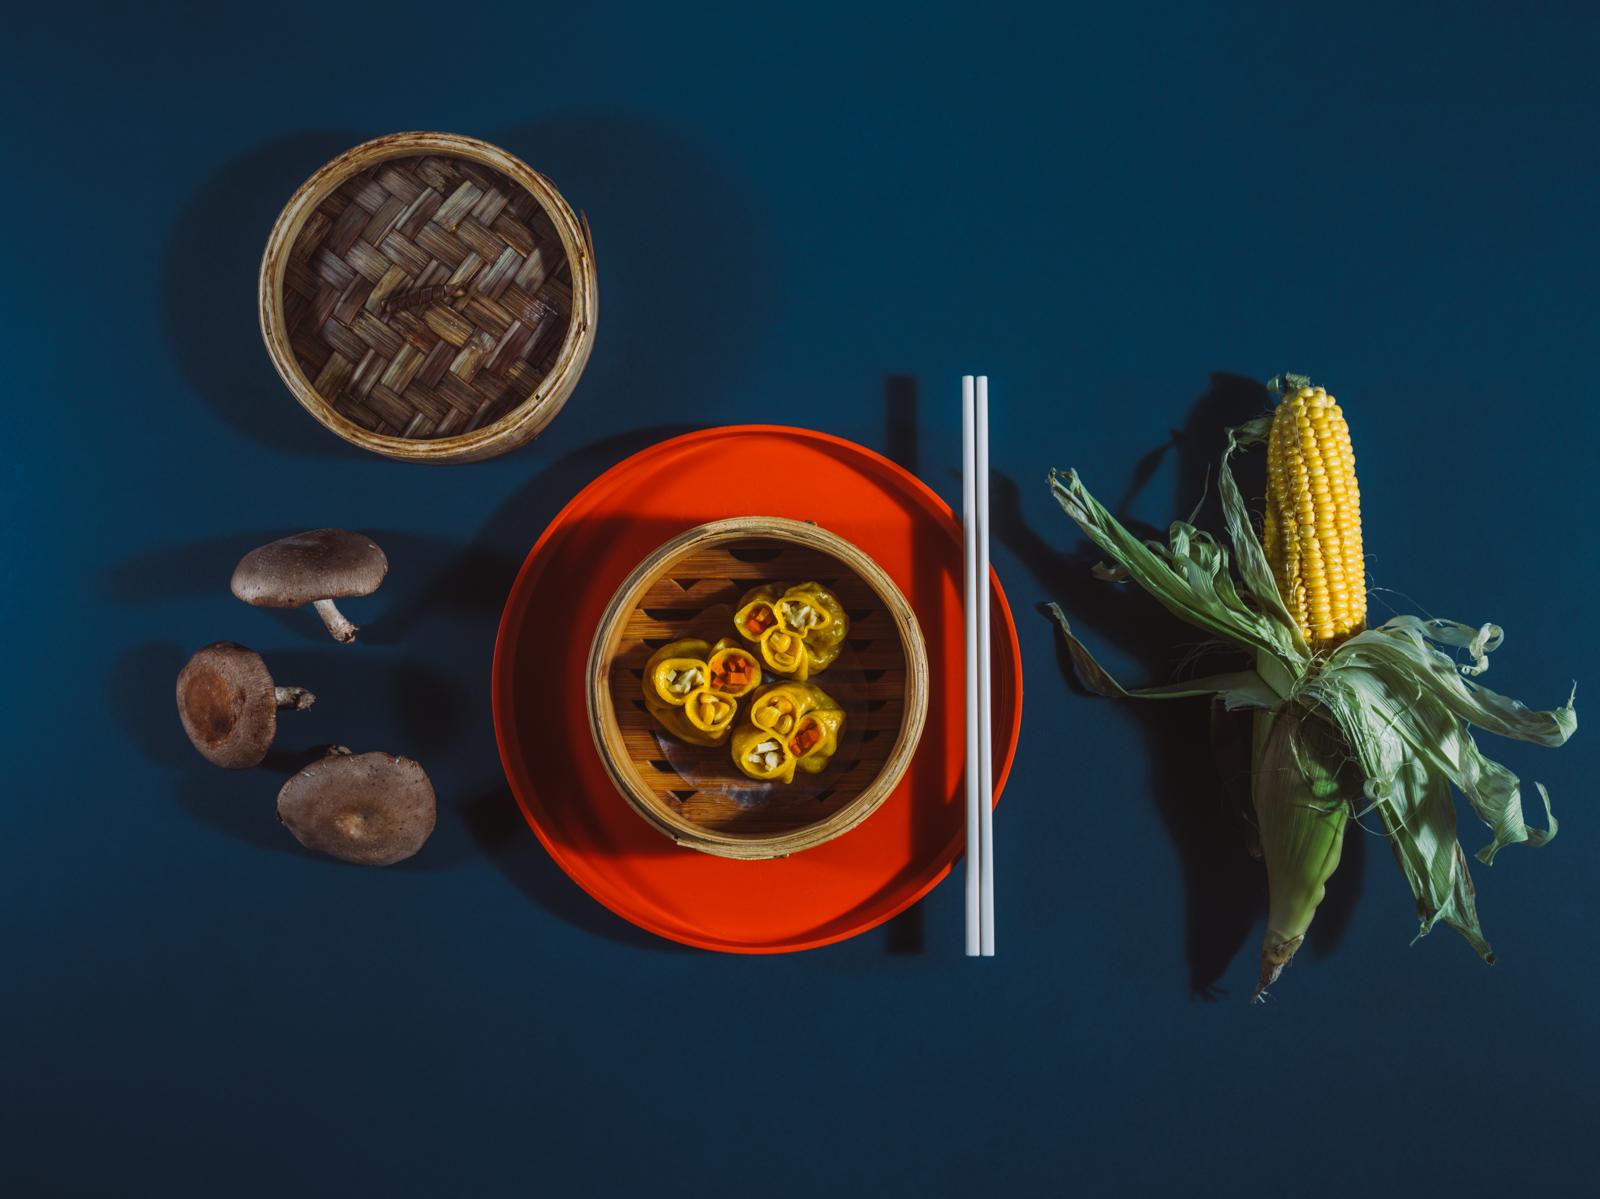 Rice-and-Gold-Food-All-Good-NYC-Nick-Johnson-Photography-31.JPG